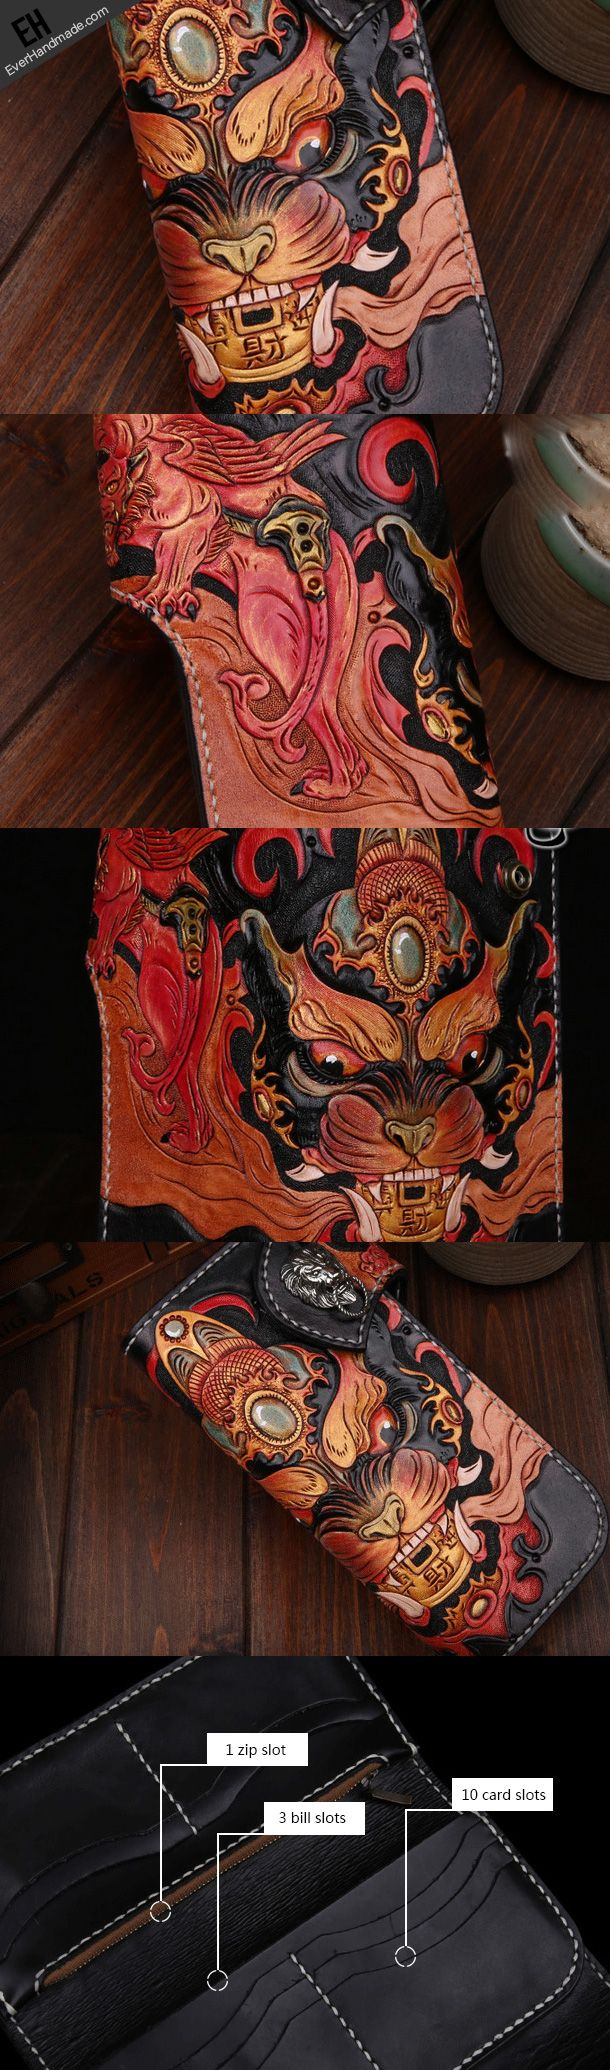 Handmade leather biker trucker wallet leather chain men Black Carved Tooled wallet